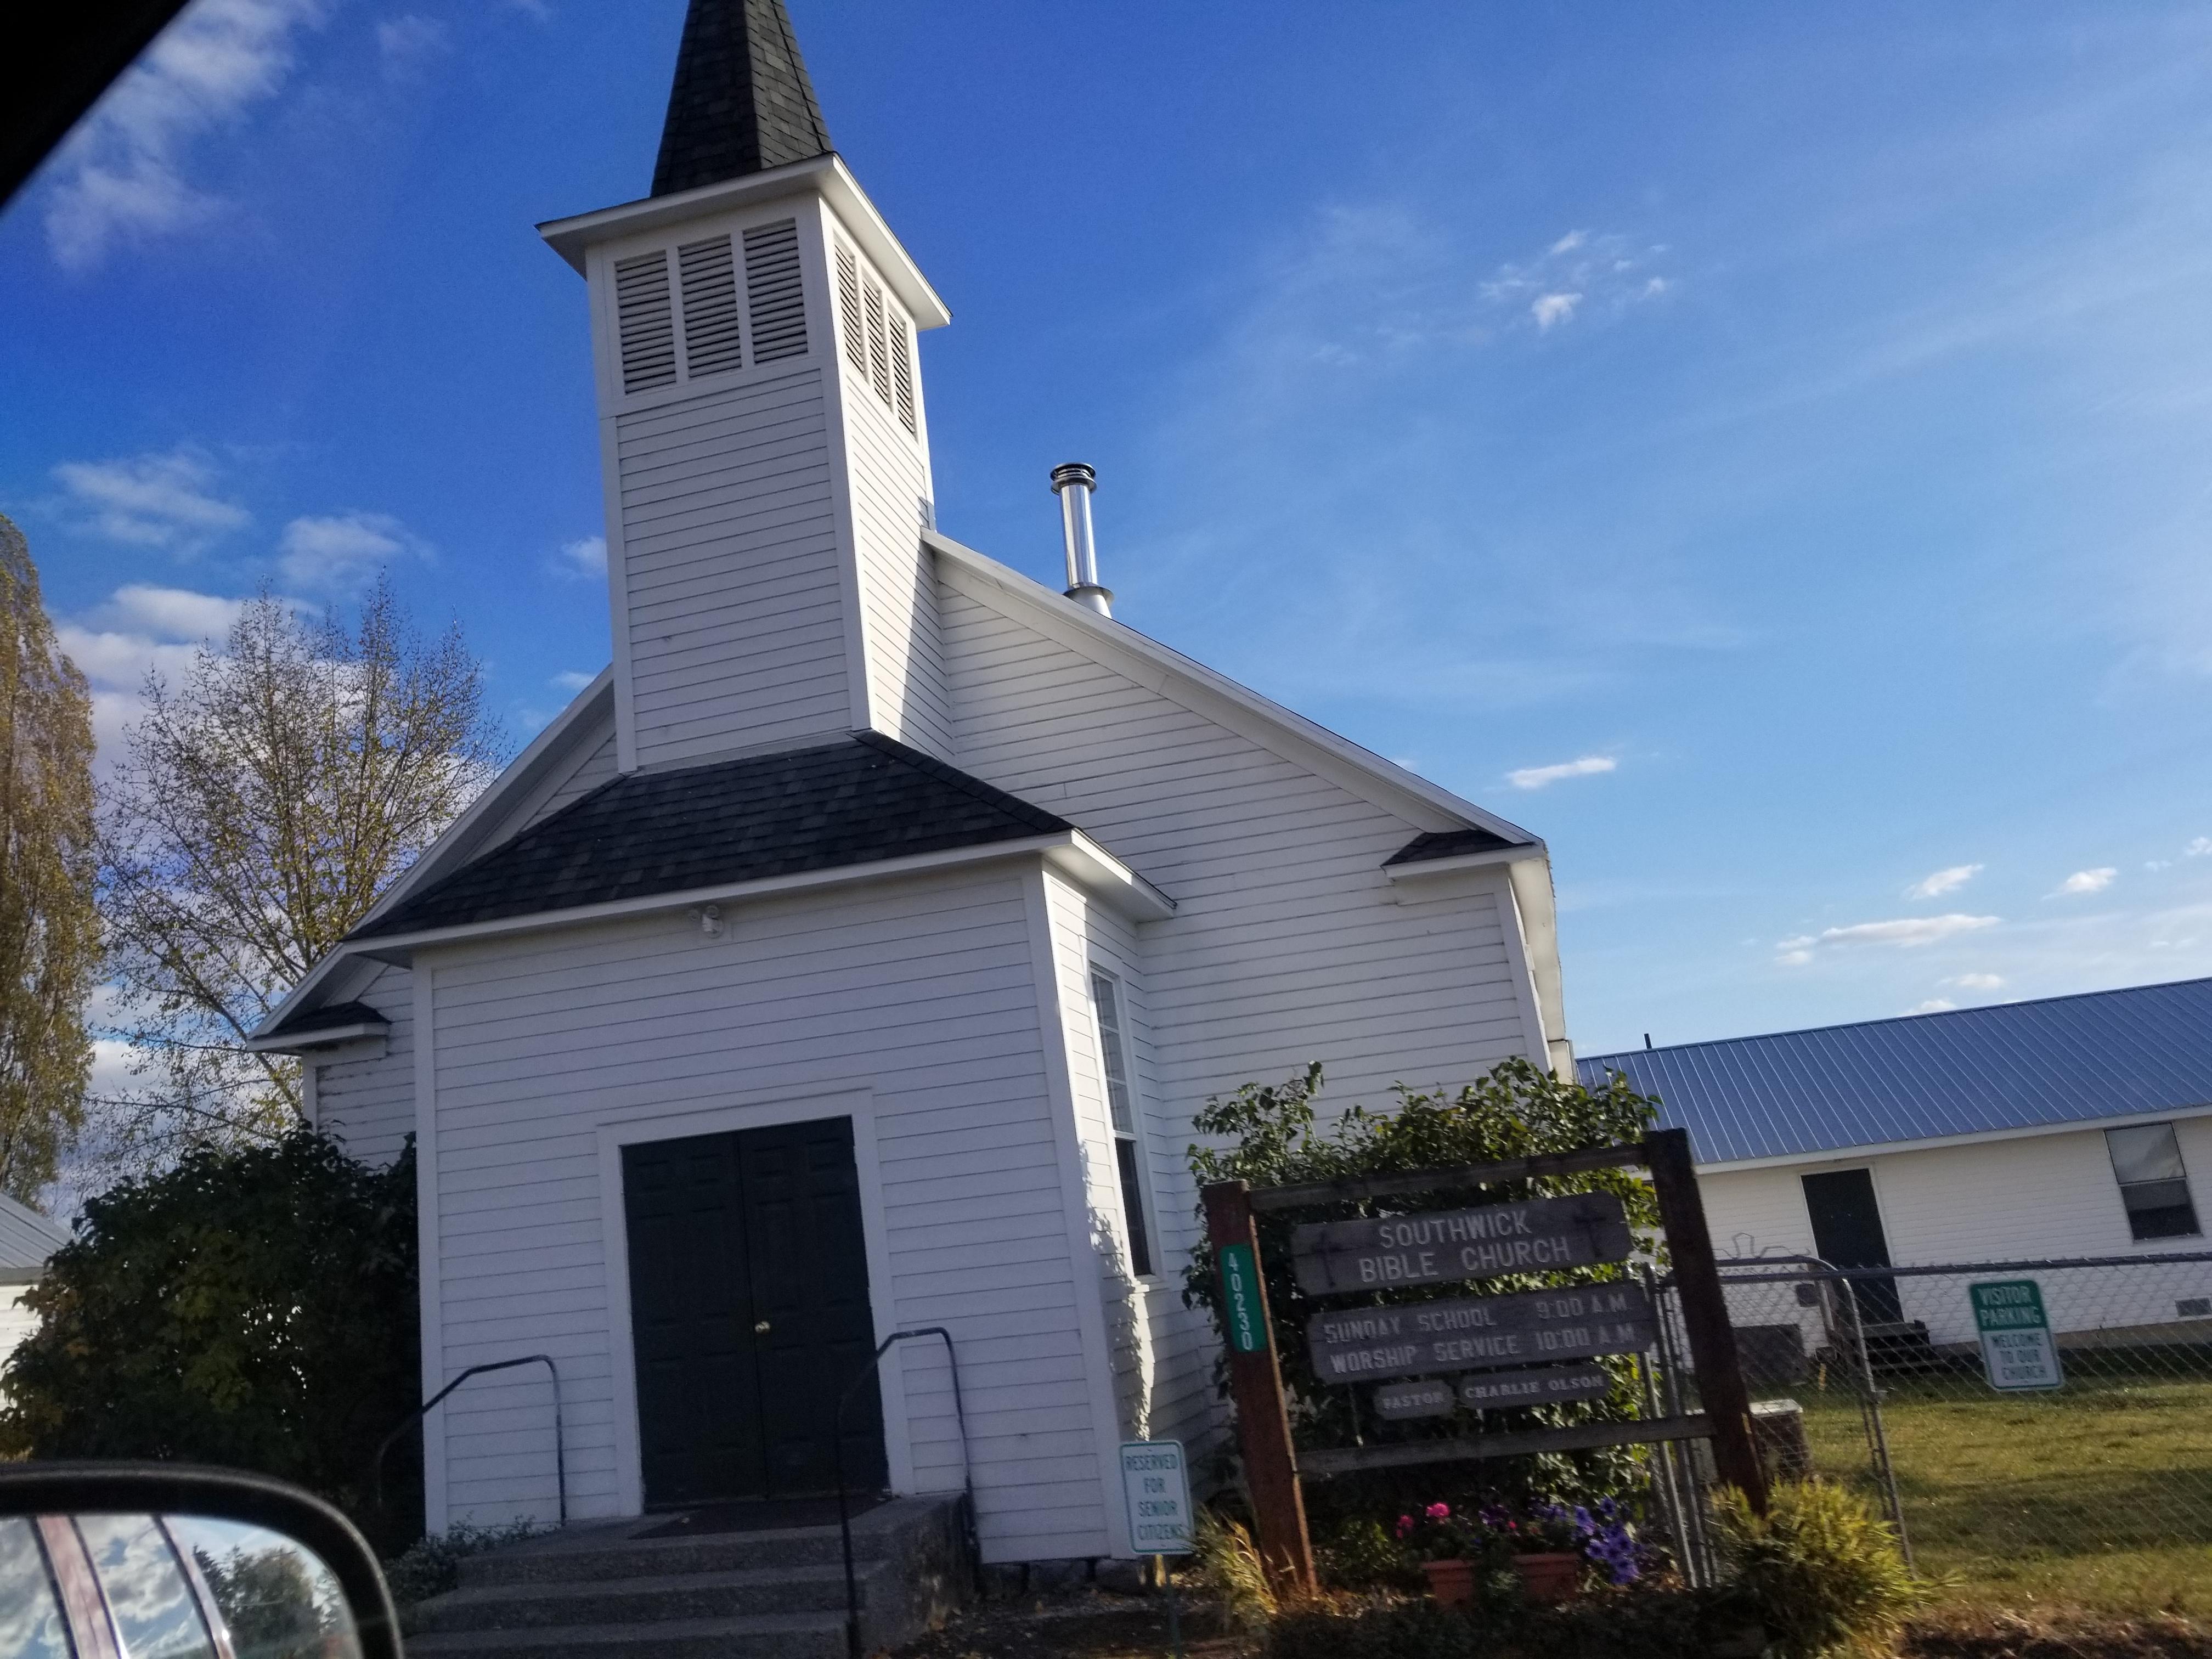 little Southwick church